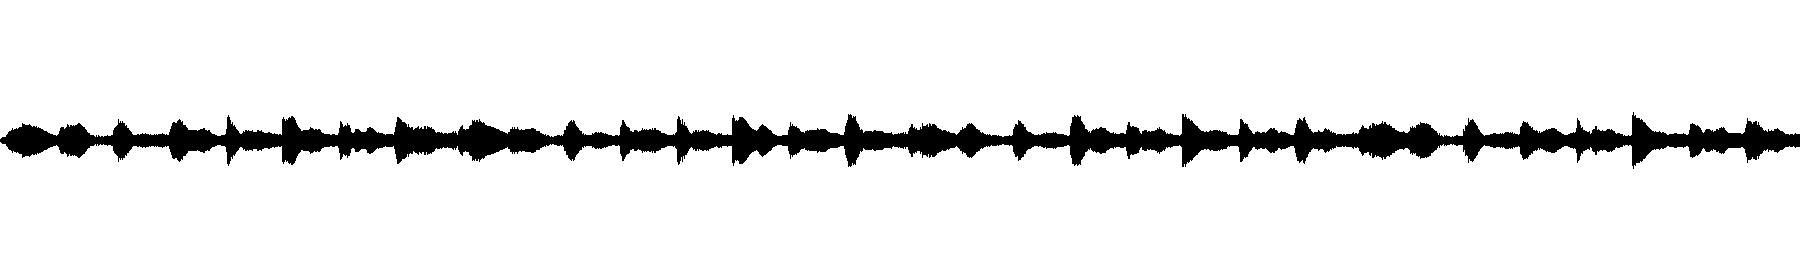 jungle master flute   140bpm   amin